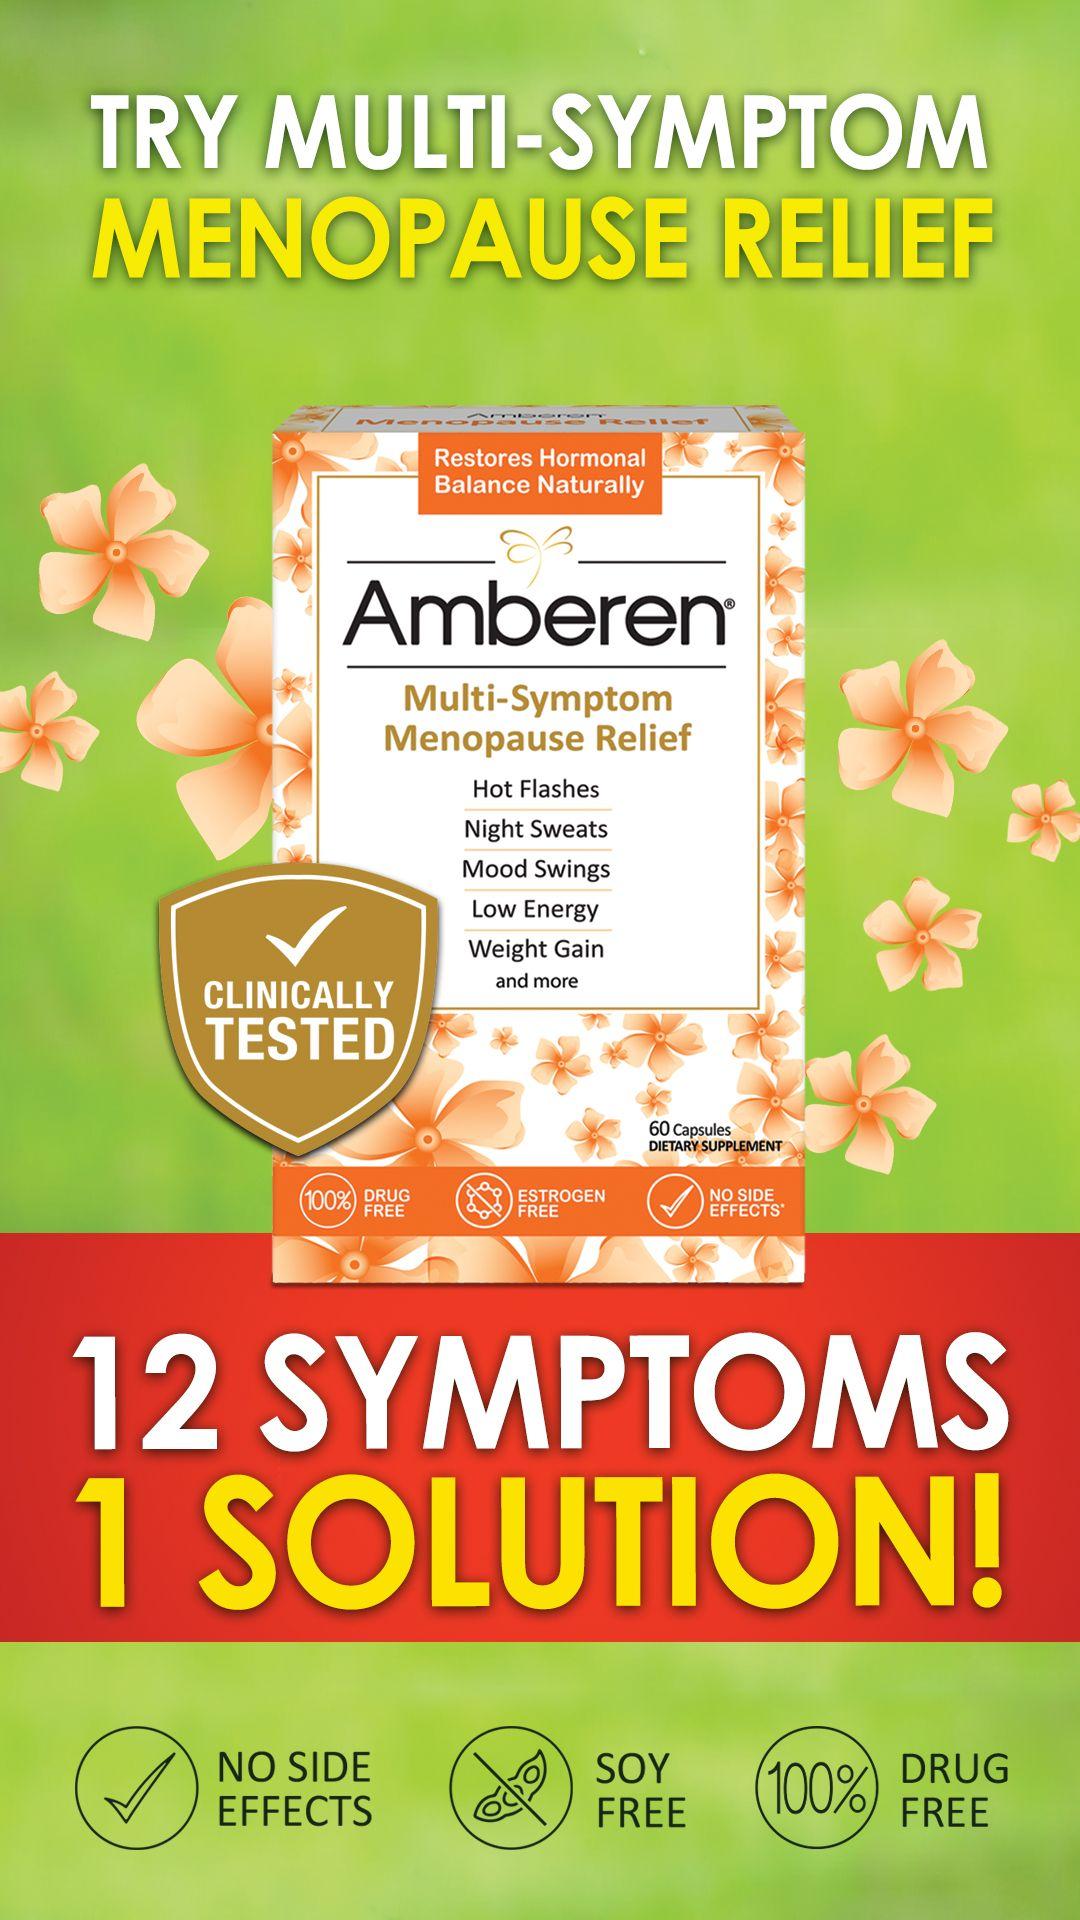 Get 10 Walmart Coupon For Amberen Menopause Relief